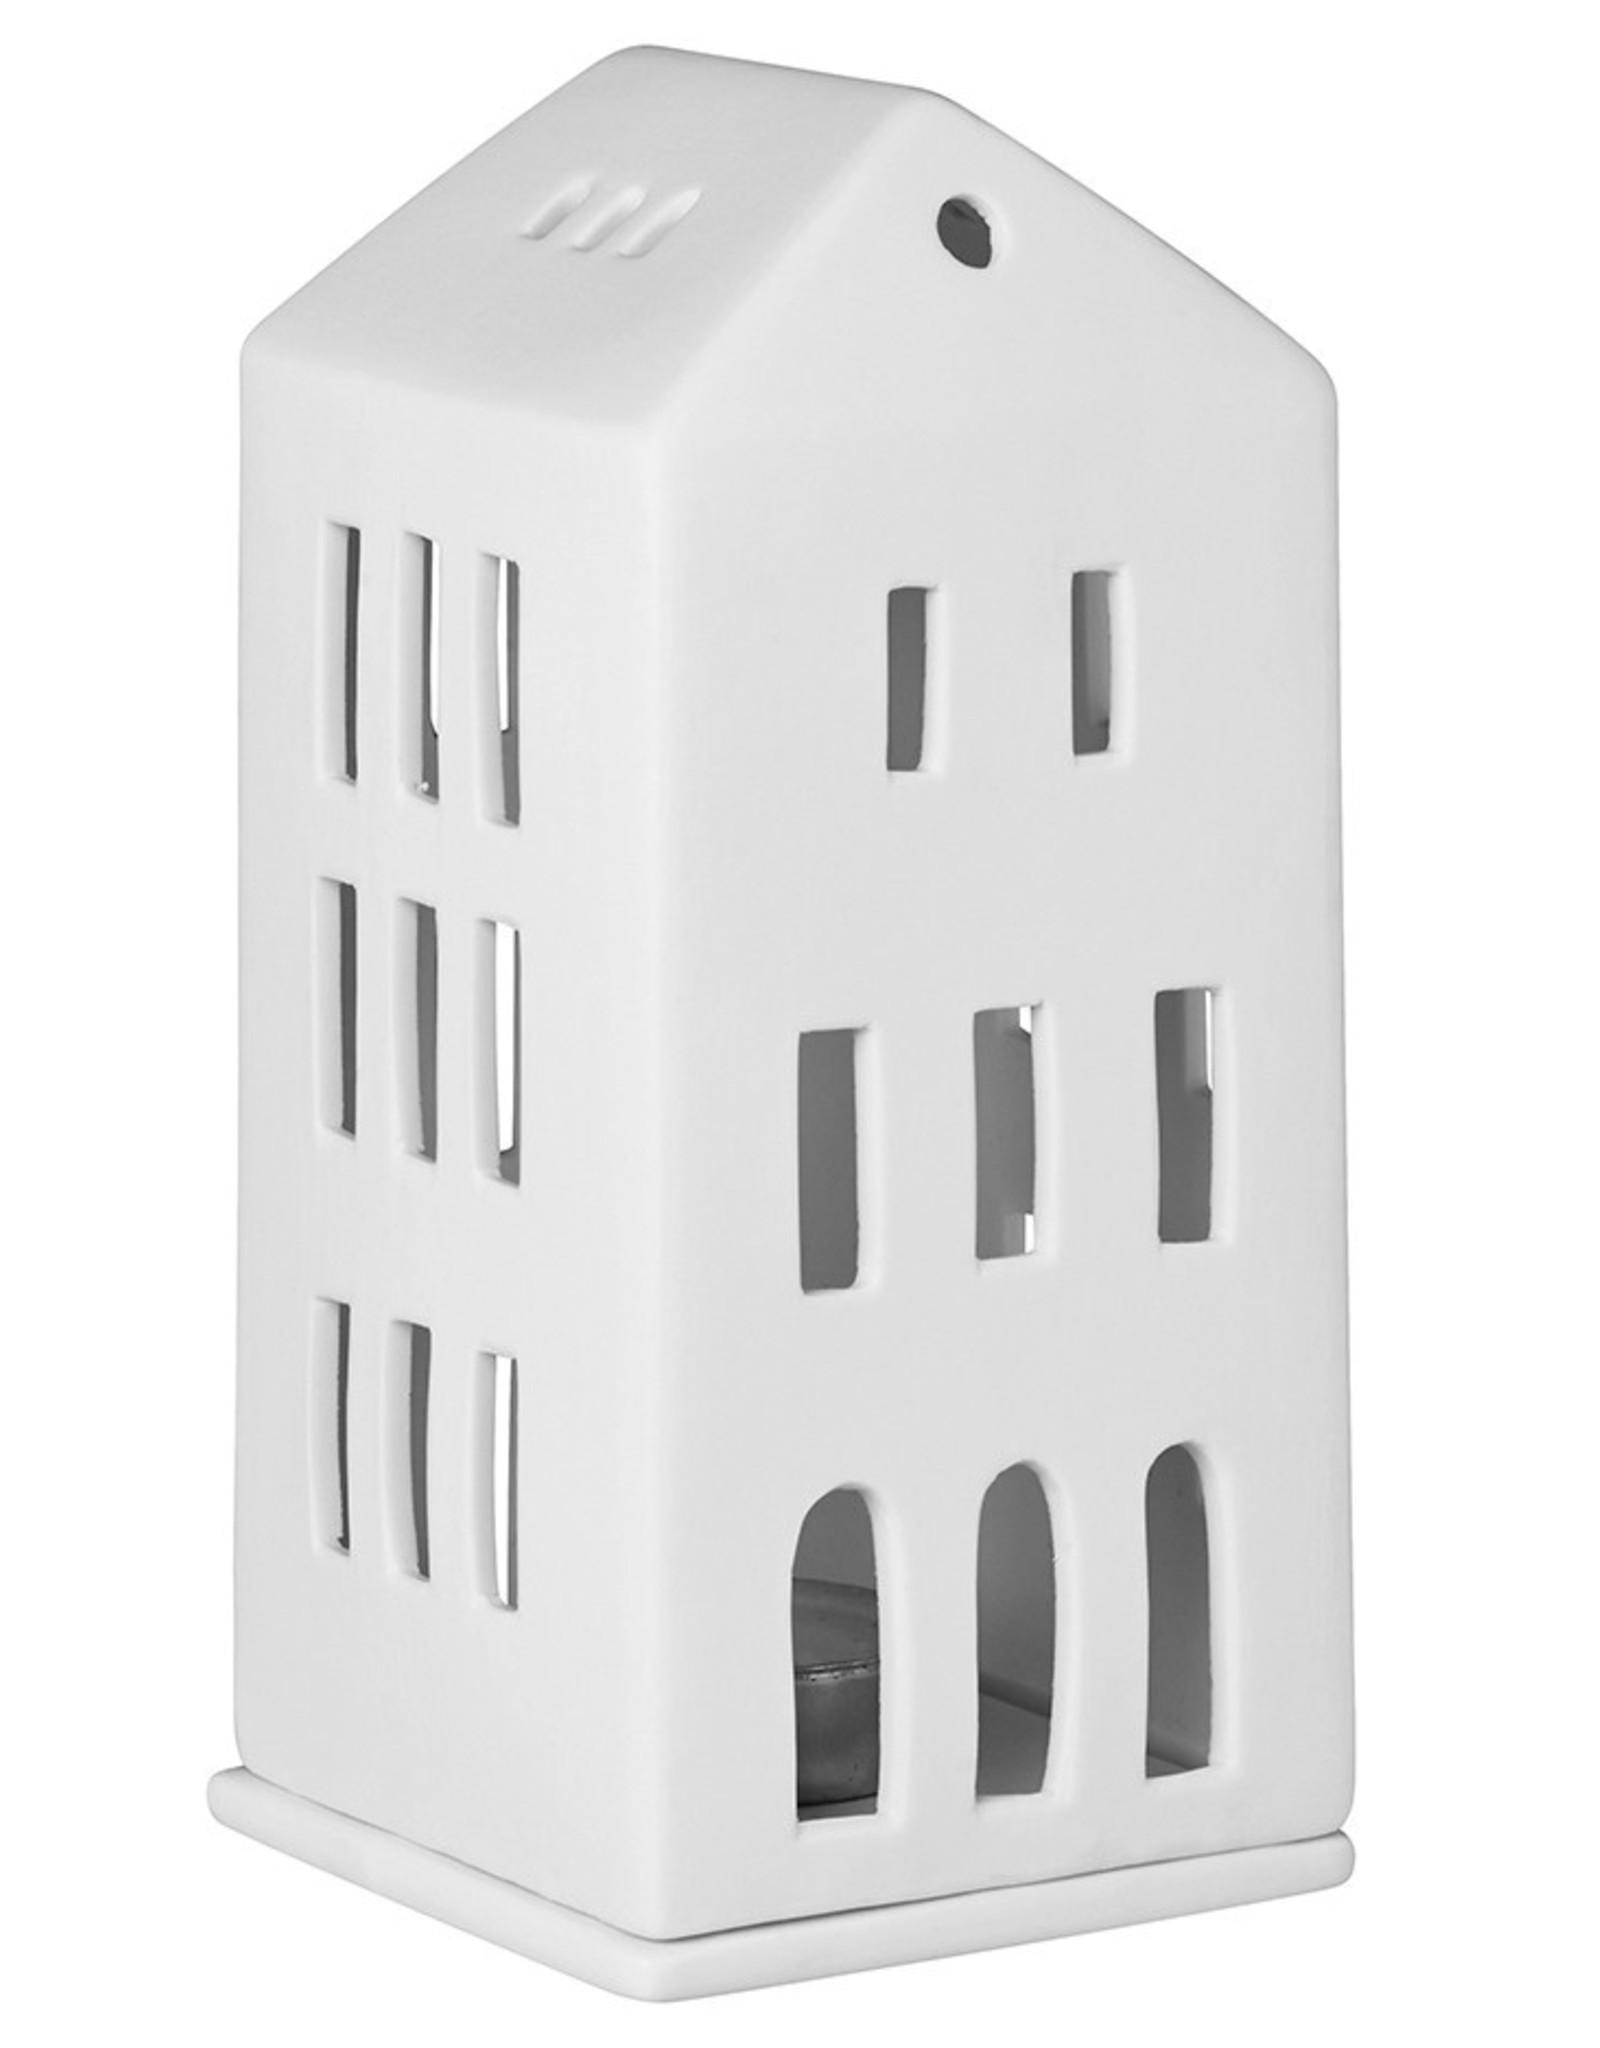 Raeder Light house- hipped roof 8x8x16,5cm